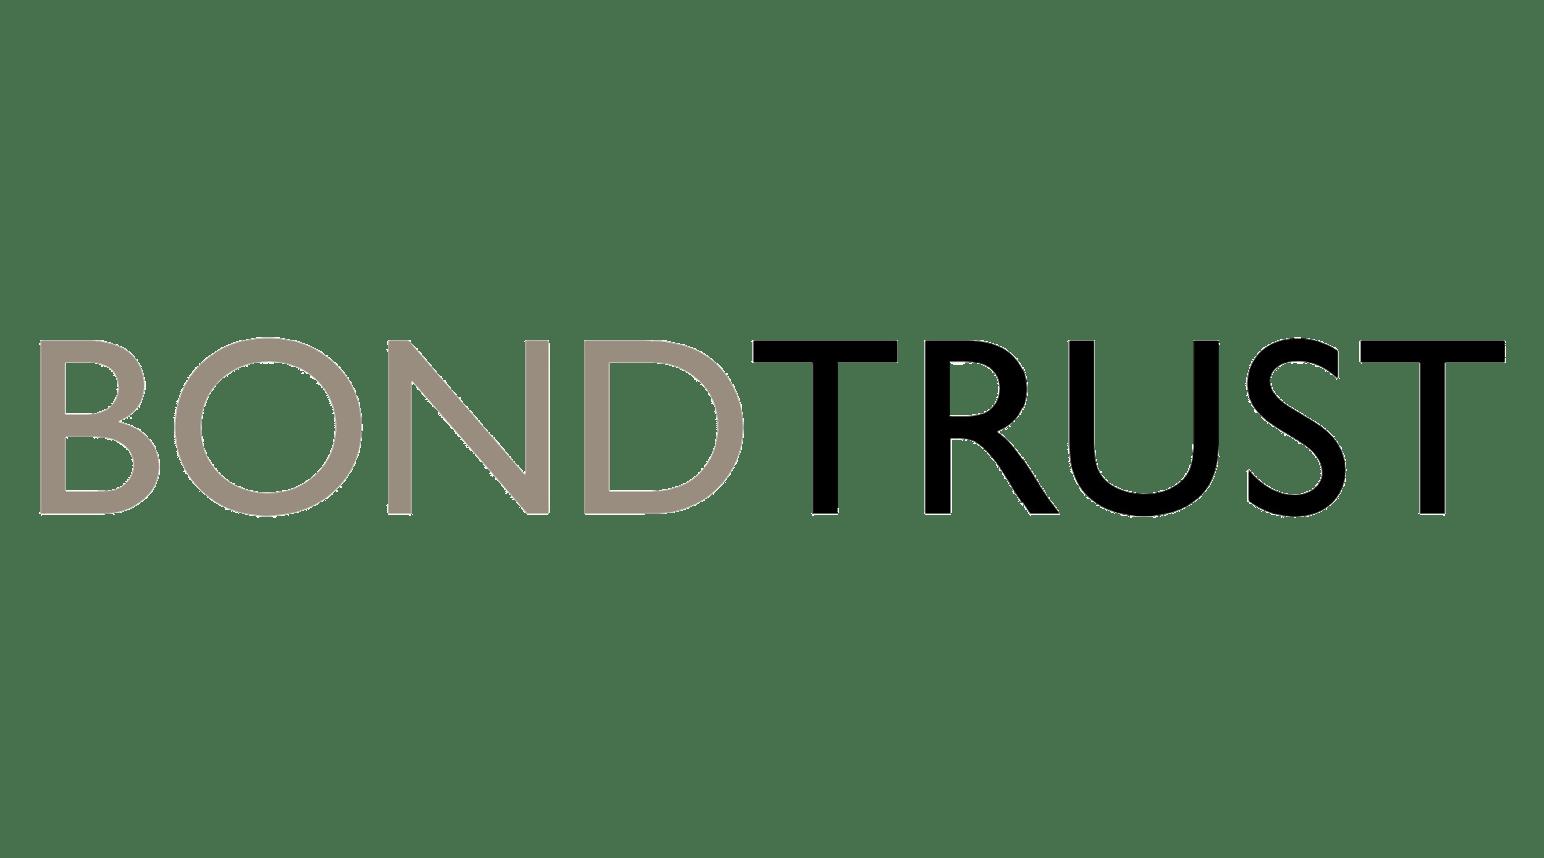 Bond Trust logo